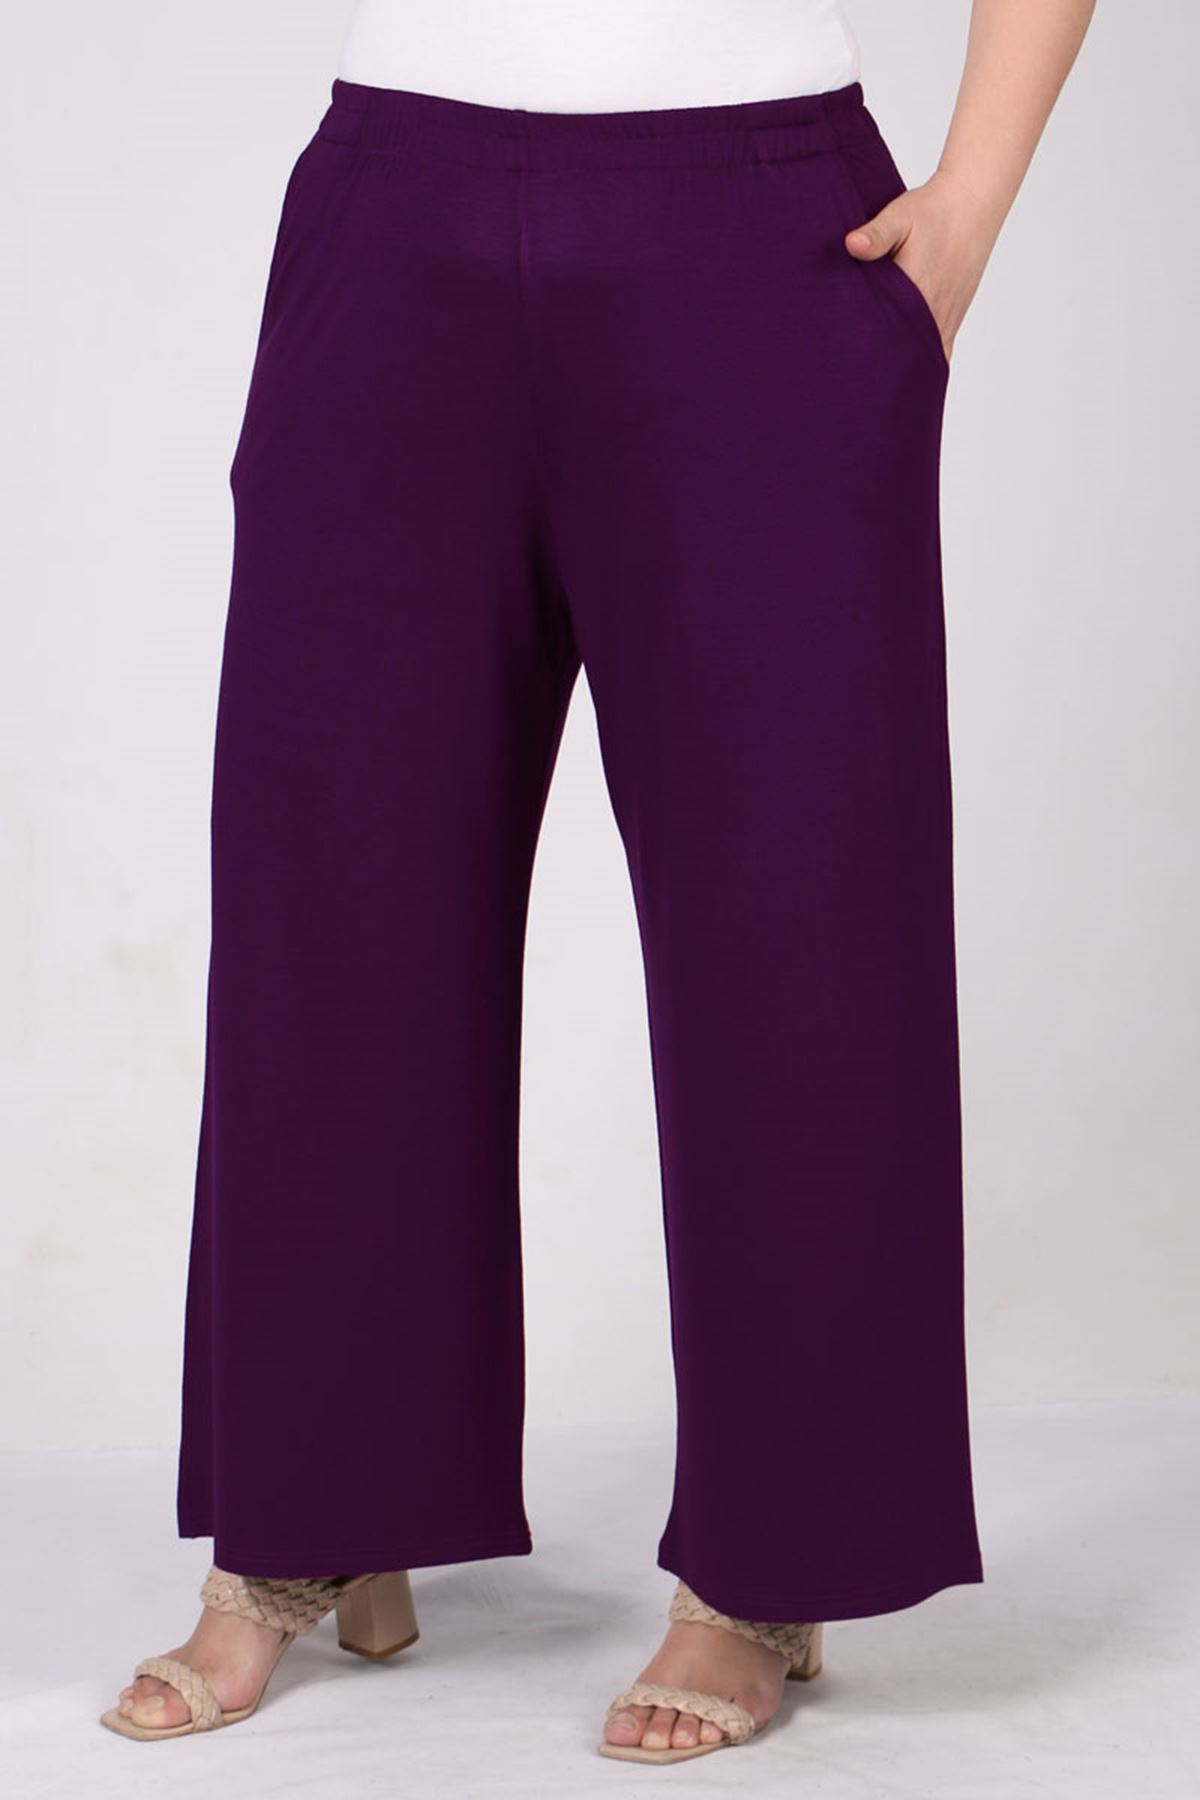 9012 Plus Size Elastic Waist Pants - Purple